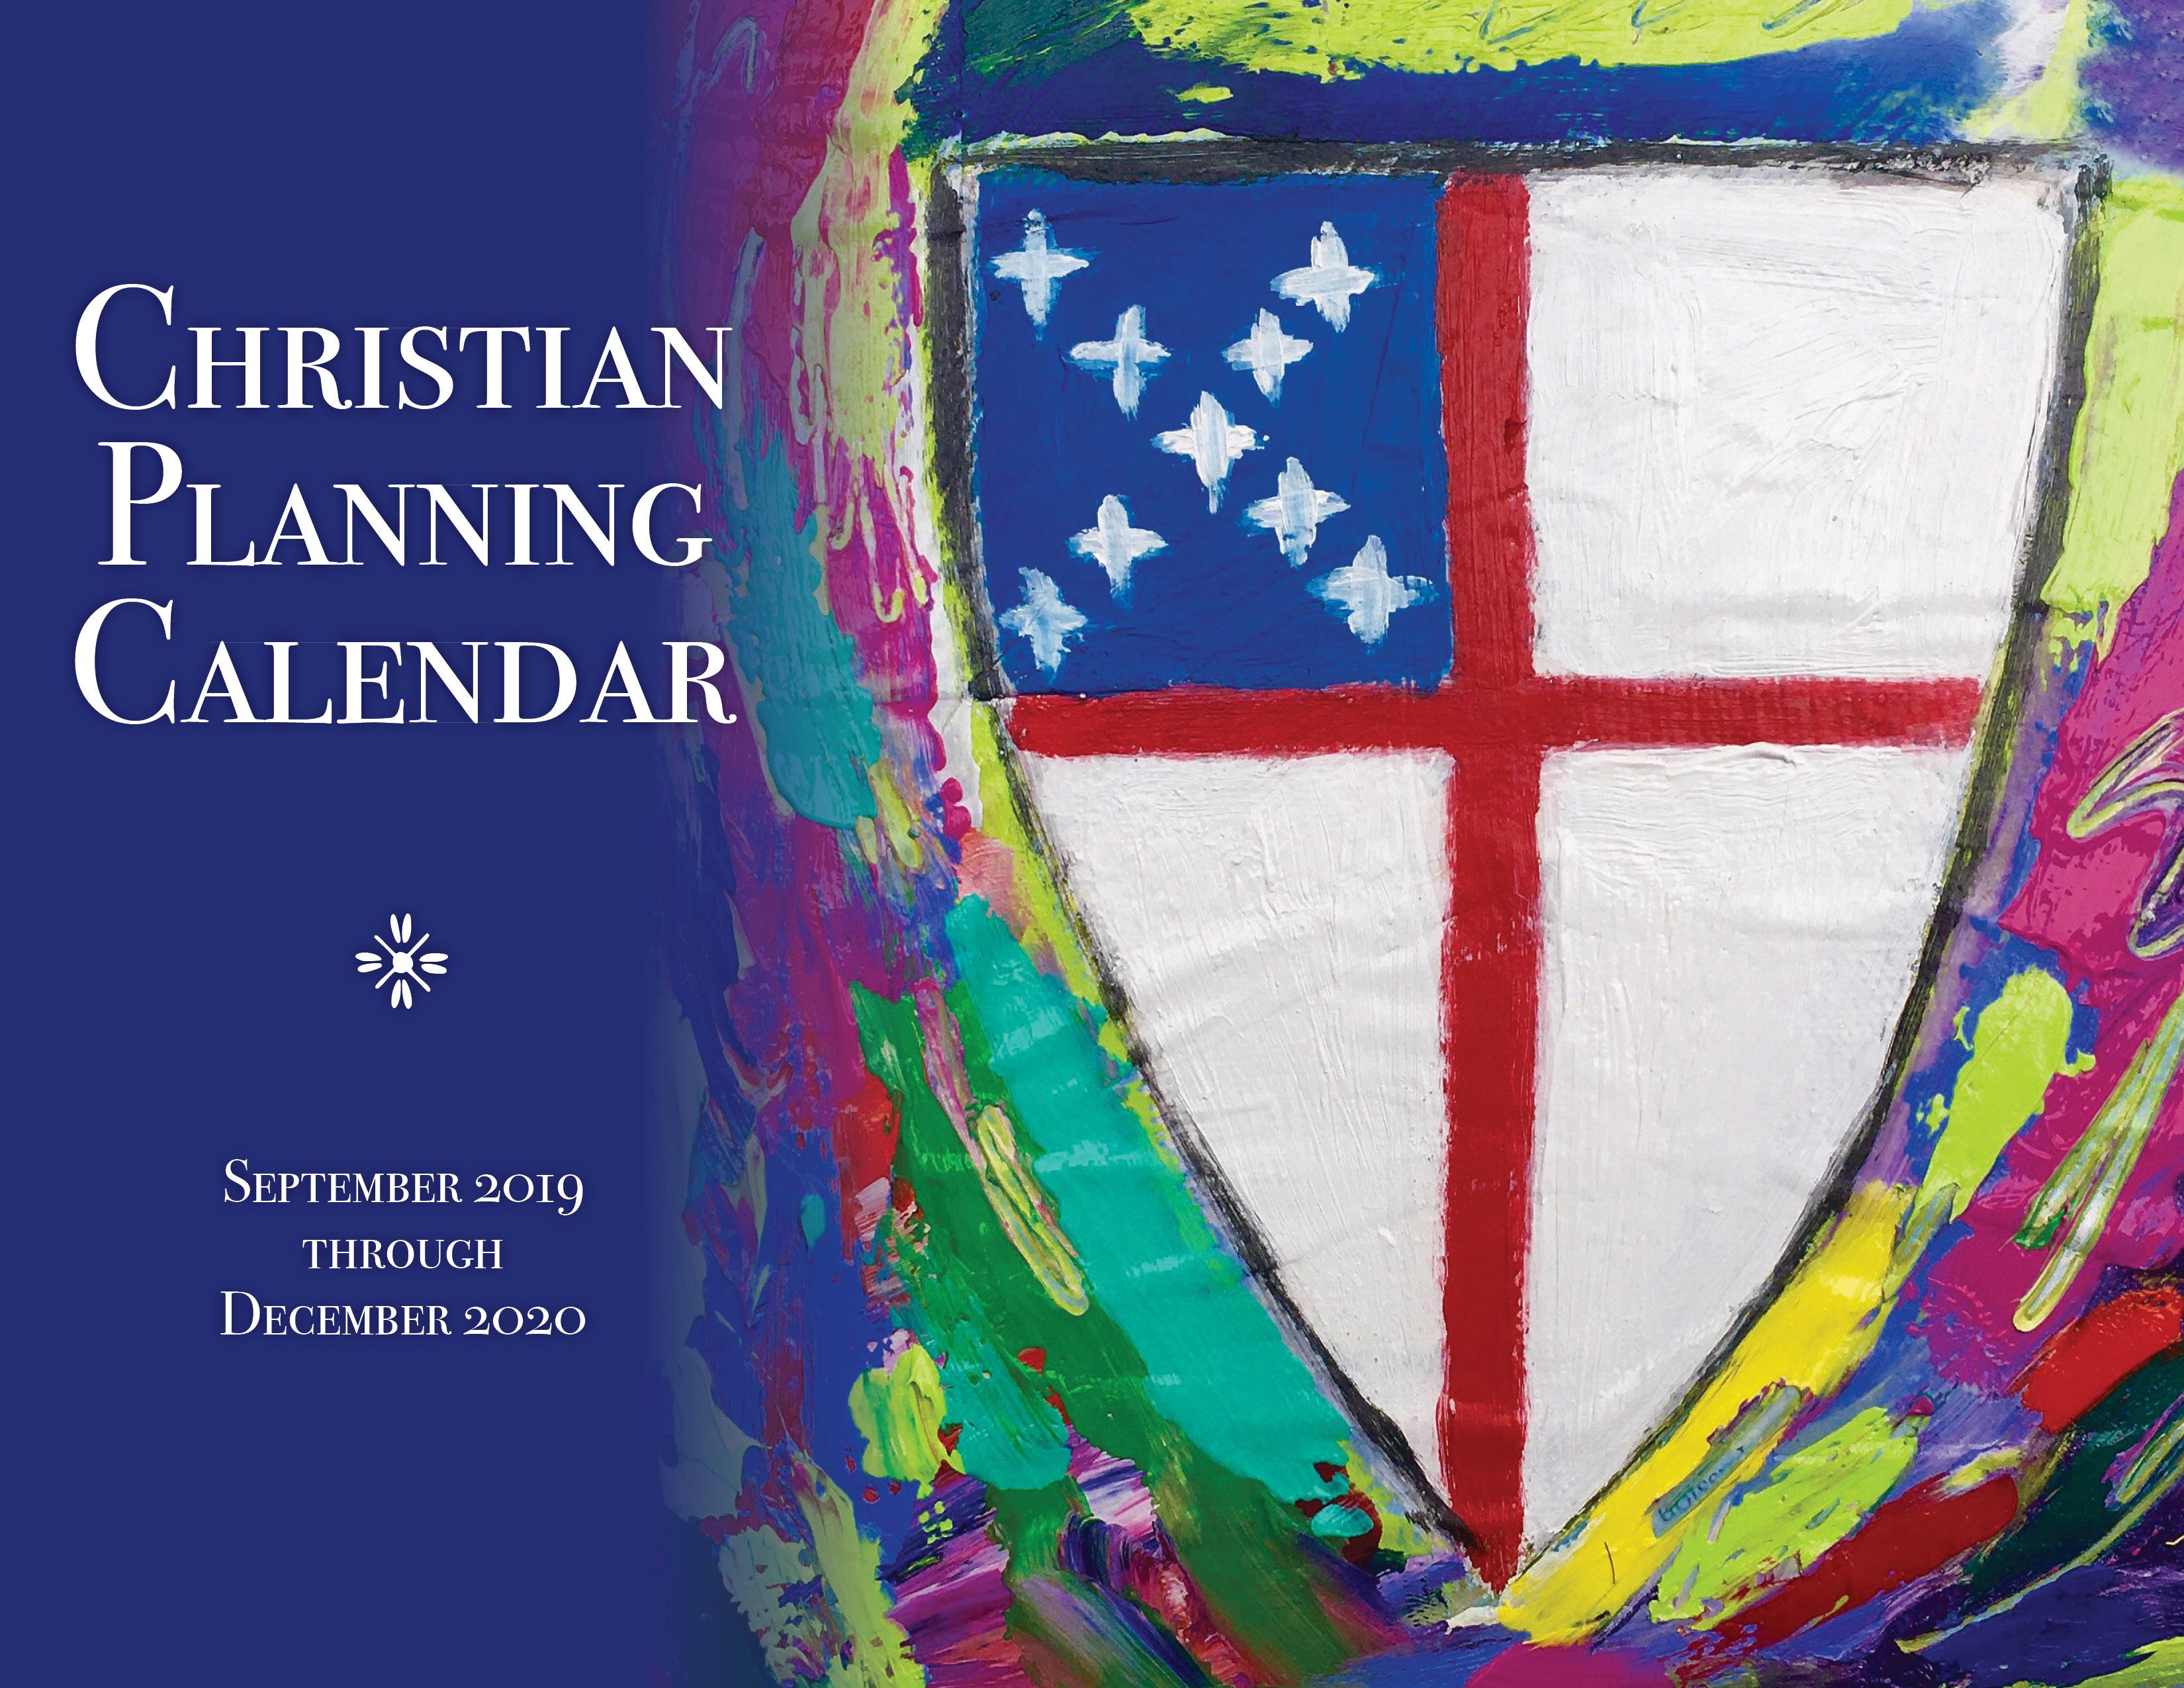 Churchpublishing: Christian Planning Calendar 2019-2020 with regard to Catholic Liturgical Calendar Year C 2019-2020